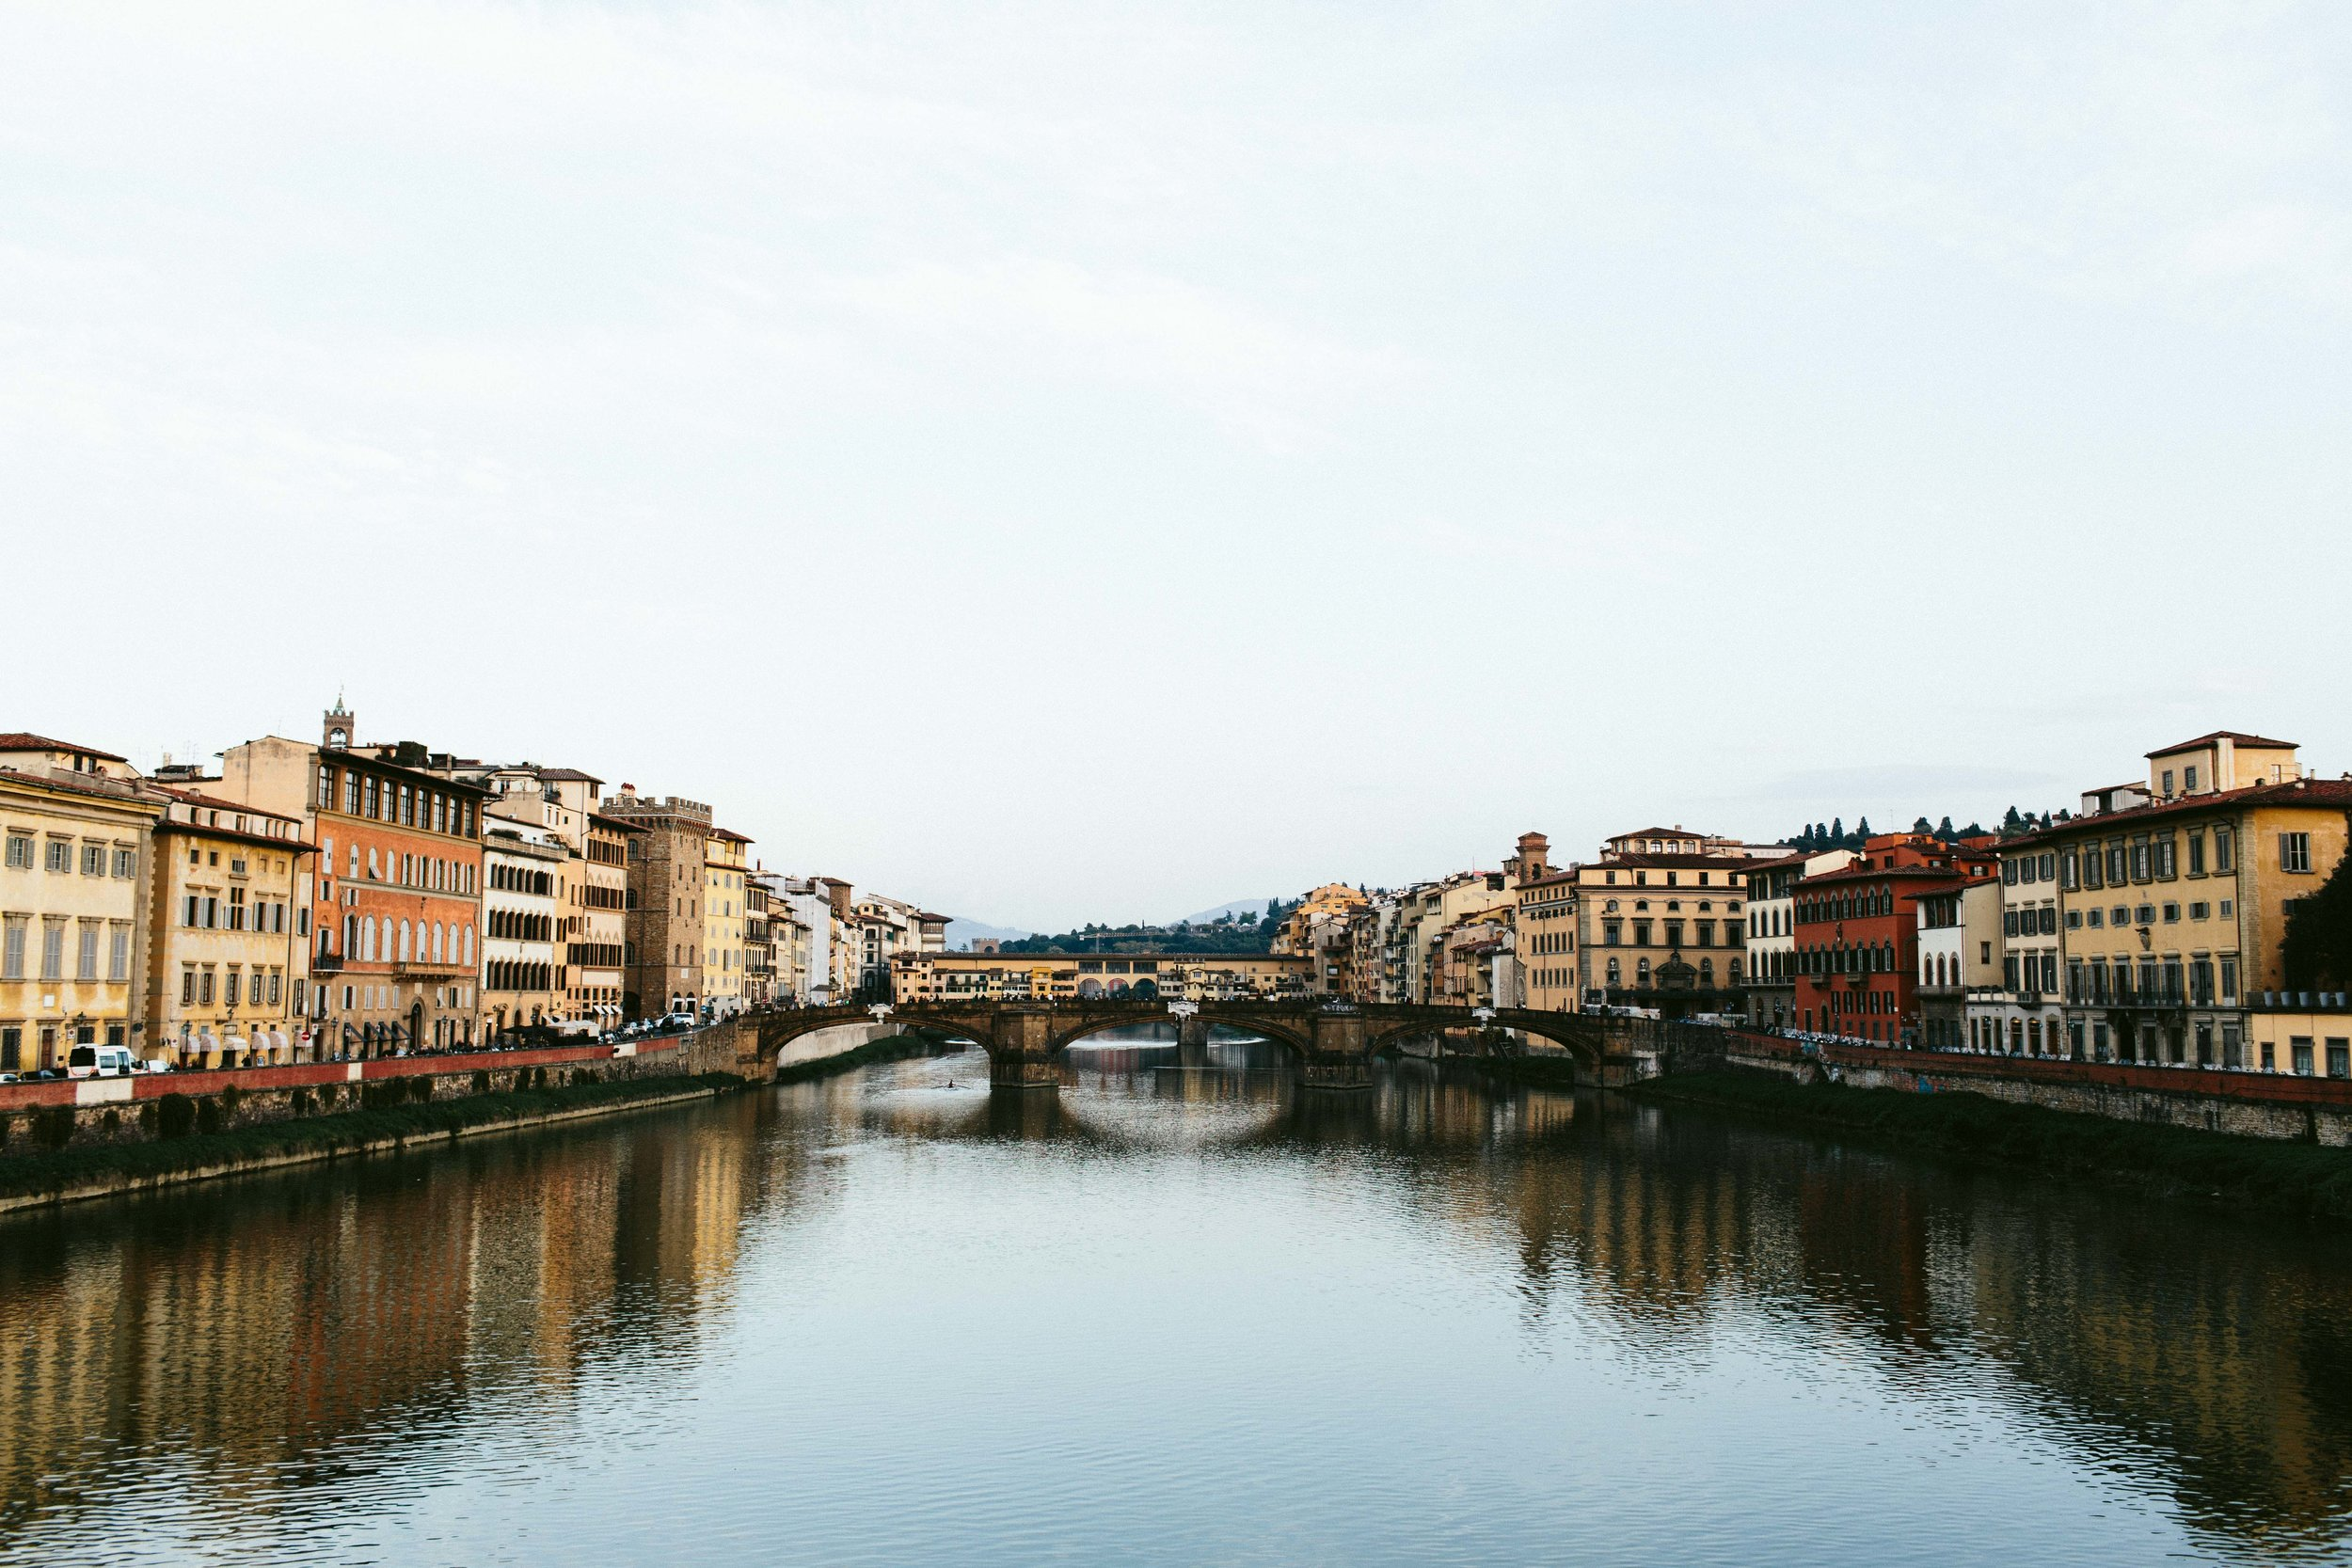 ITALY2015-119-51.jpg